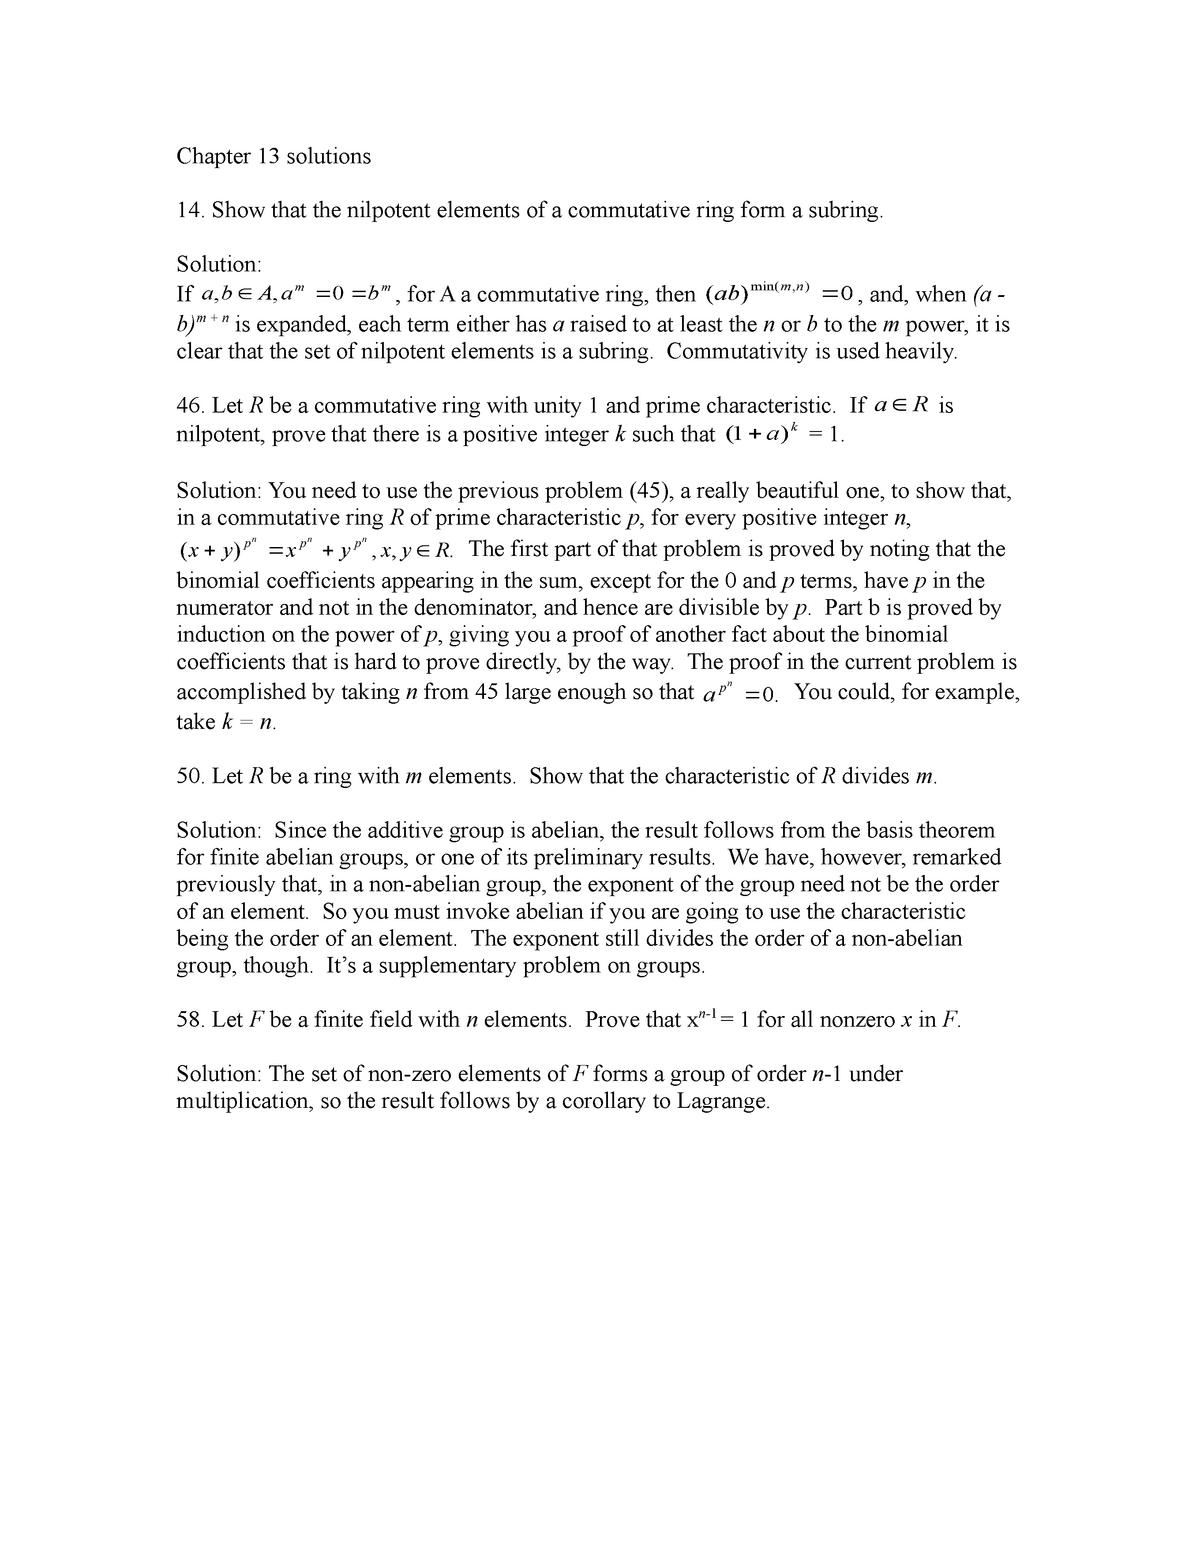 Chapter 13 Solutions Studocu [ 1553 x 1200 Pixel ]